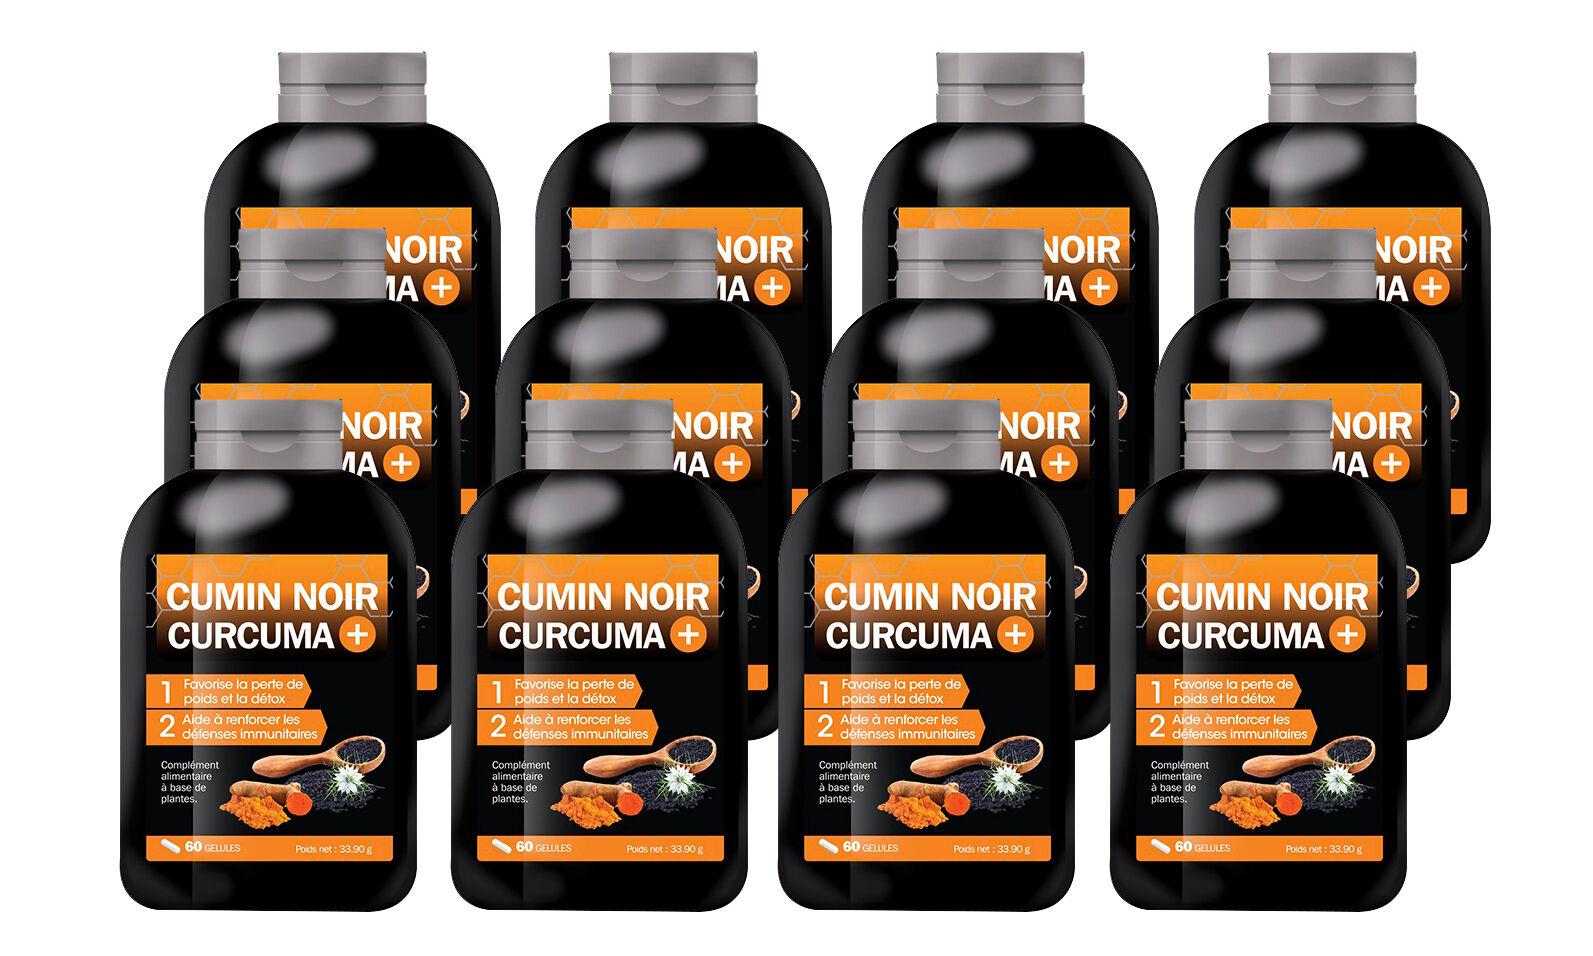 Groupon Goods Cumin Noir Curcuma + : 12 mois (720 gélules)